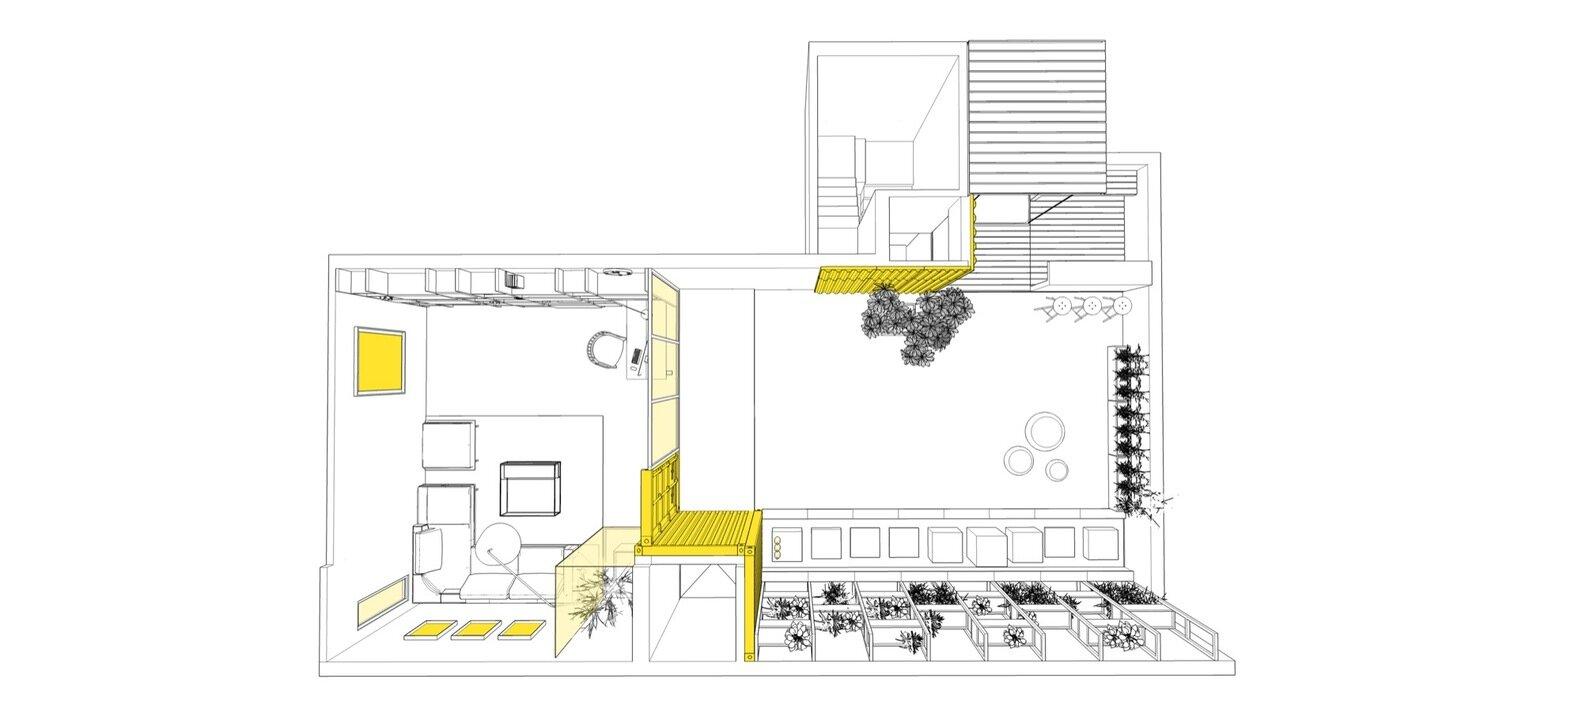 Studio for Two - Studio Wood - India - Floor Plan - Humble Homes